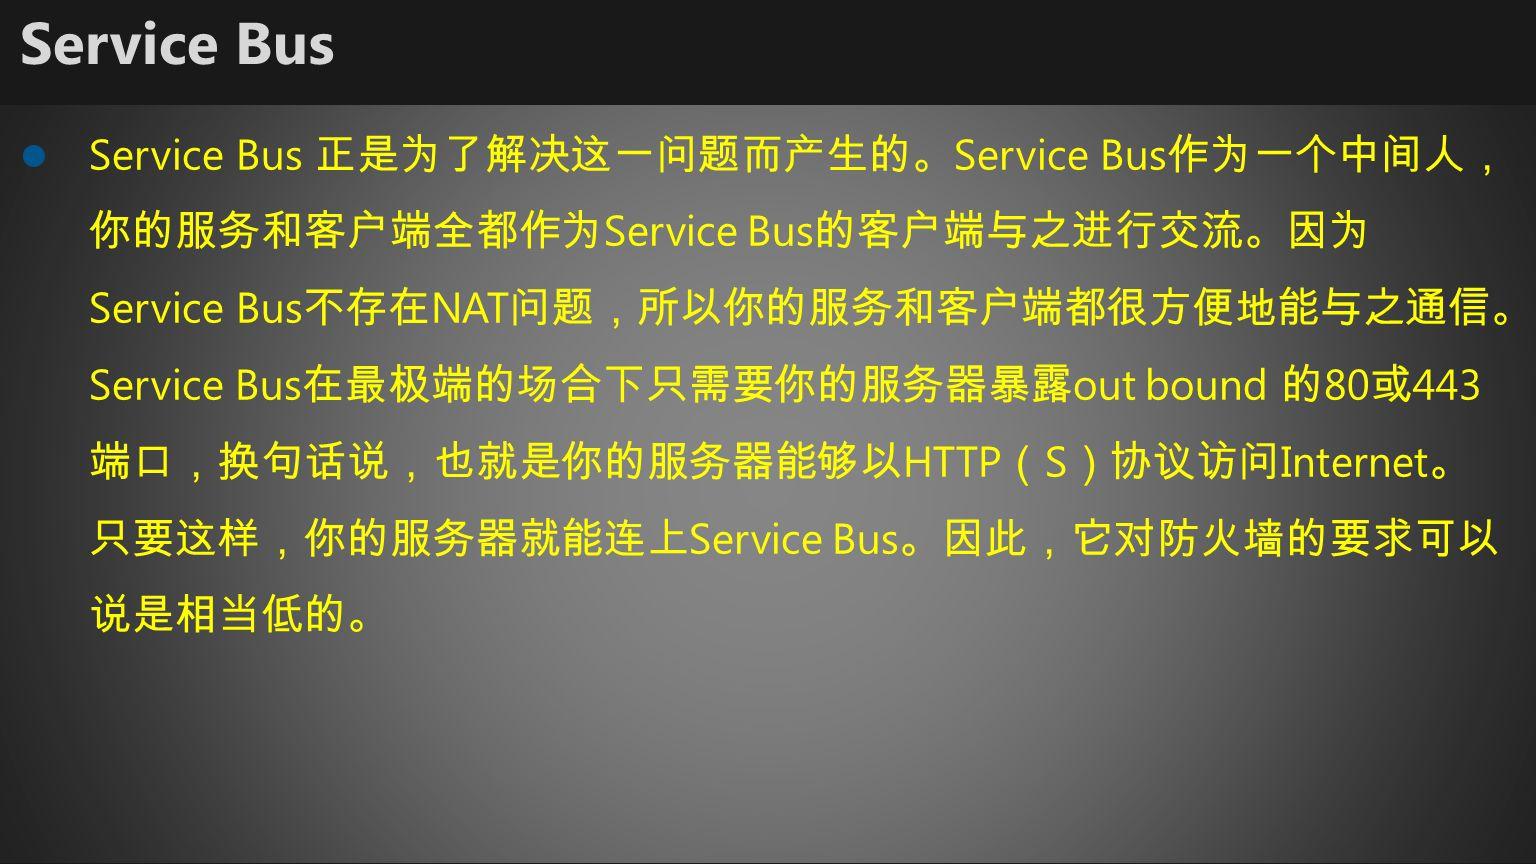 Service Bus Service Bus Service Bus Service Bus Service Bus NAT Service Bus out bound 80 443 HTTP S Internet Service Bus